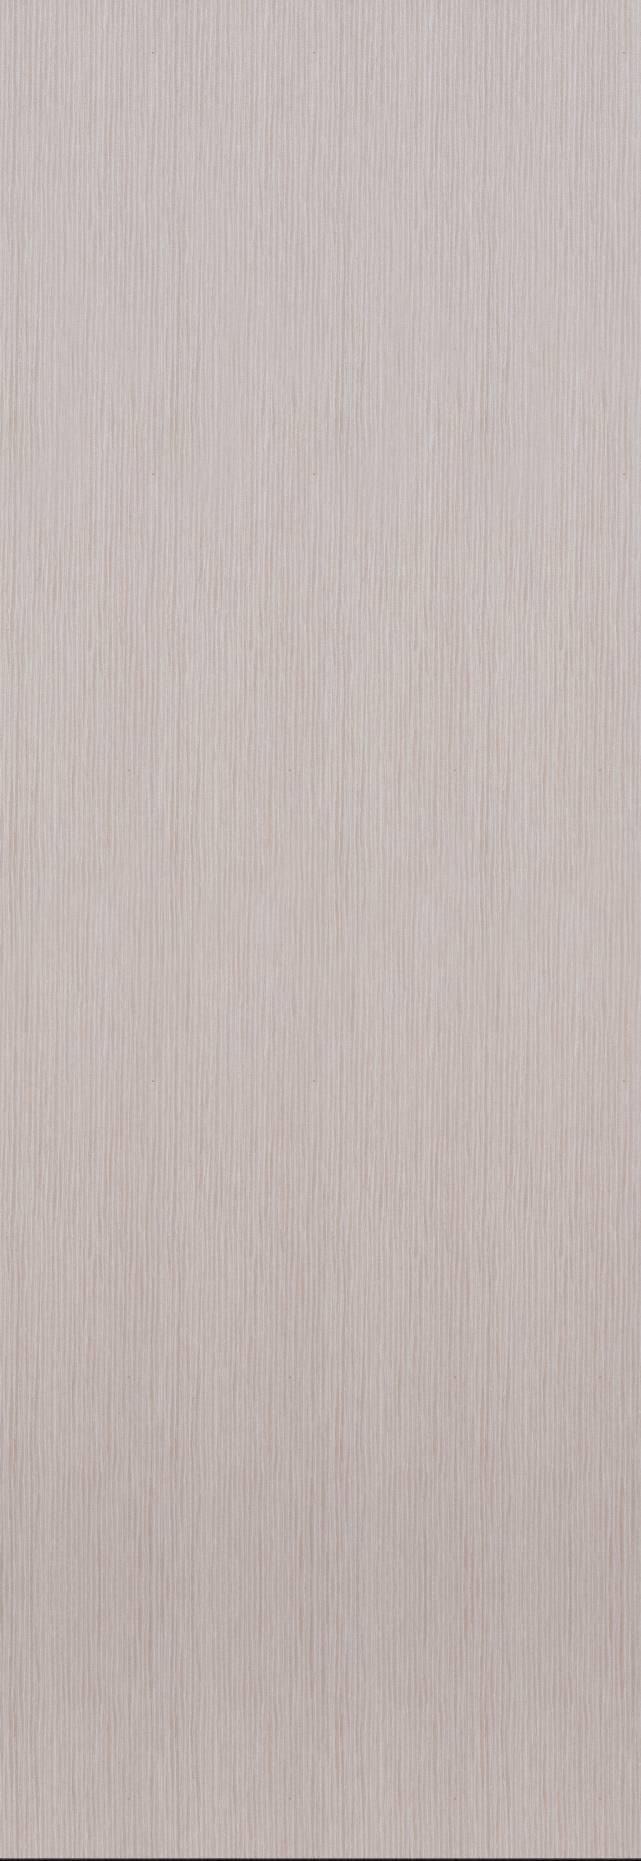 Tivoli А-1 Invisible цвет - Дымчатый дуб Без стекла (ДГ)